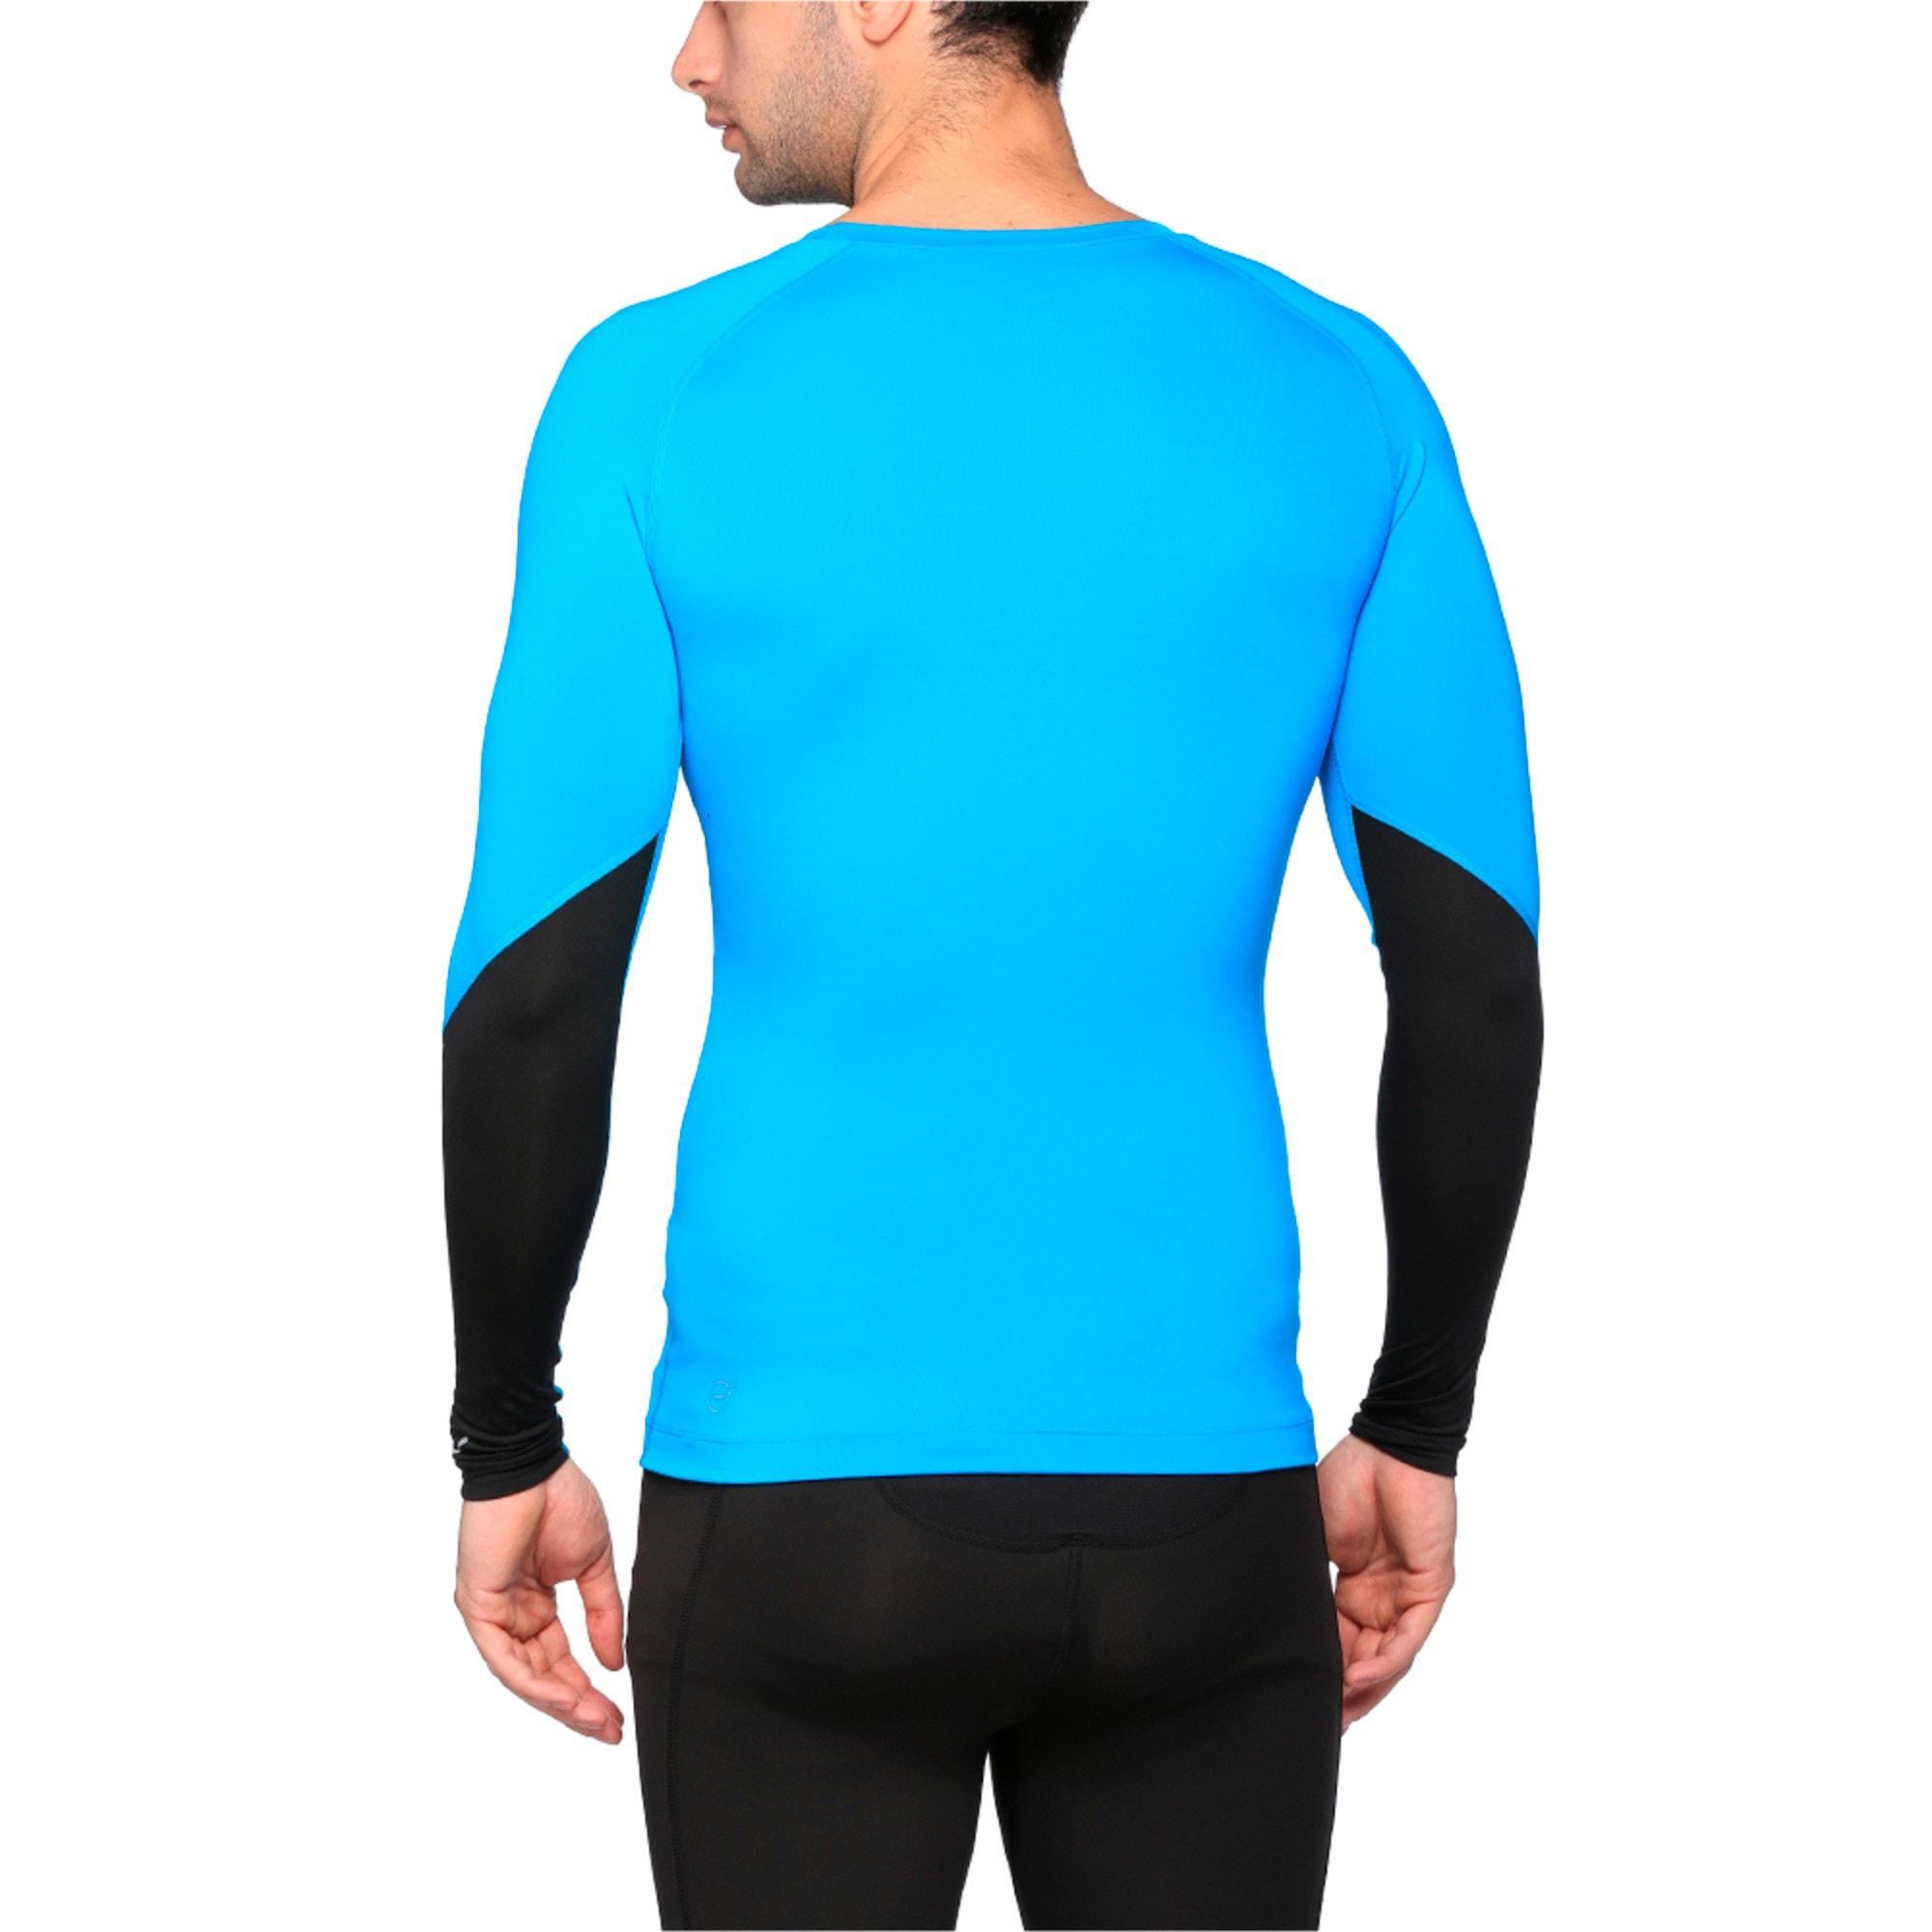 Thumbnail 4 of Training Lite Long Sleeve, BLUE DANUBE-Puma Black, medium-IND